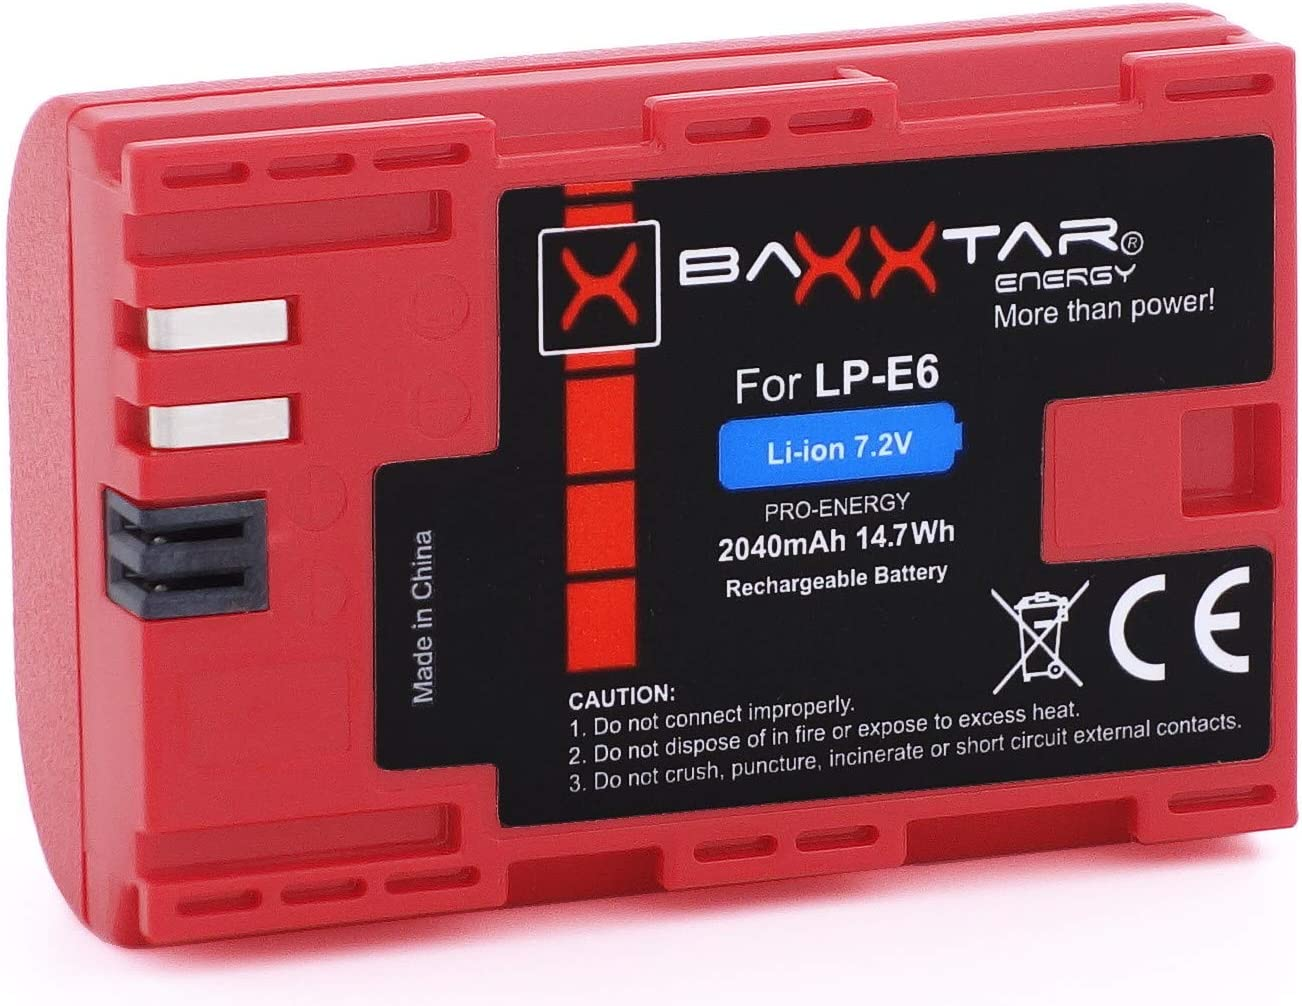 Baxxtar Pro Qualitätsakku Ersatz Für Akku Canon Lp E6 Kamera